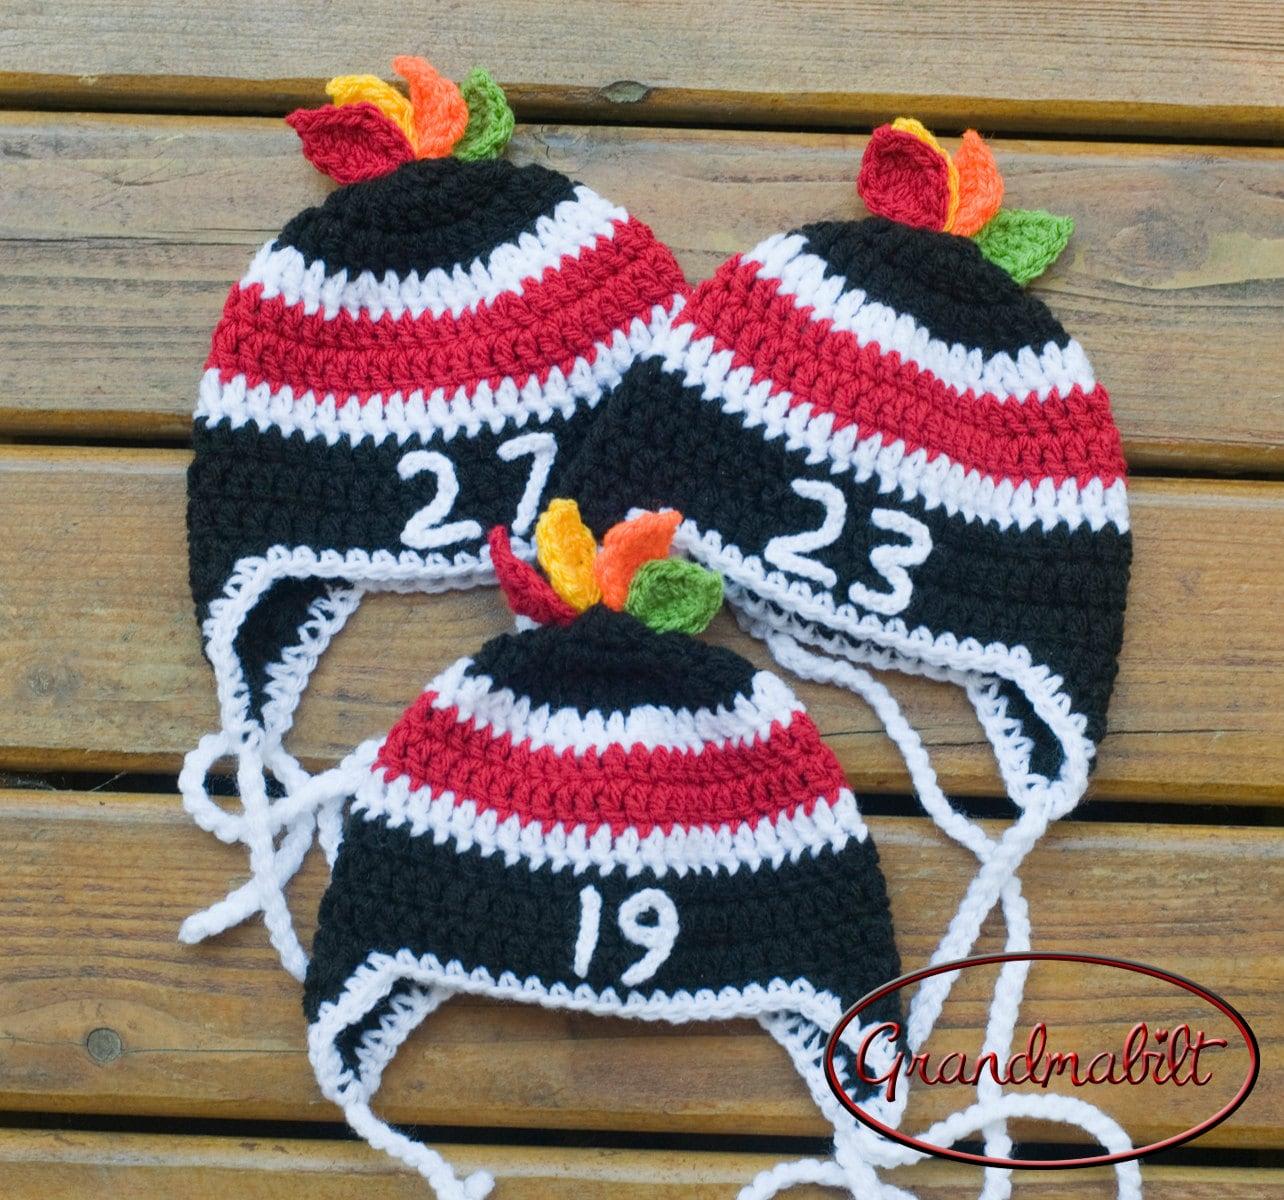 Free Crochet Pattern For Baby Hockey Helmet : Customized for rpkeck Chicago Blackhawks Baby by Grandmabilt